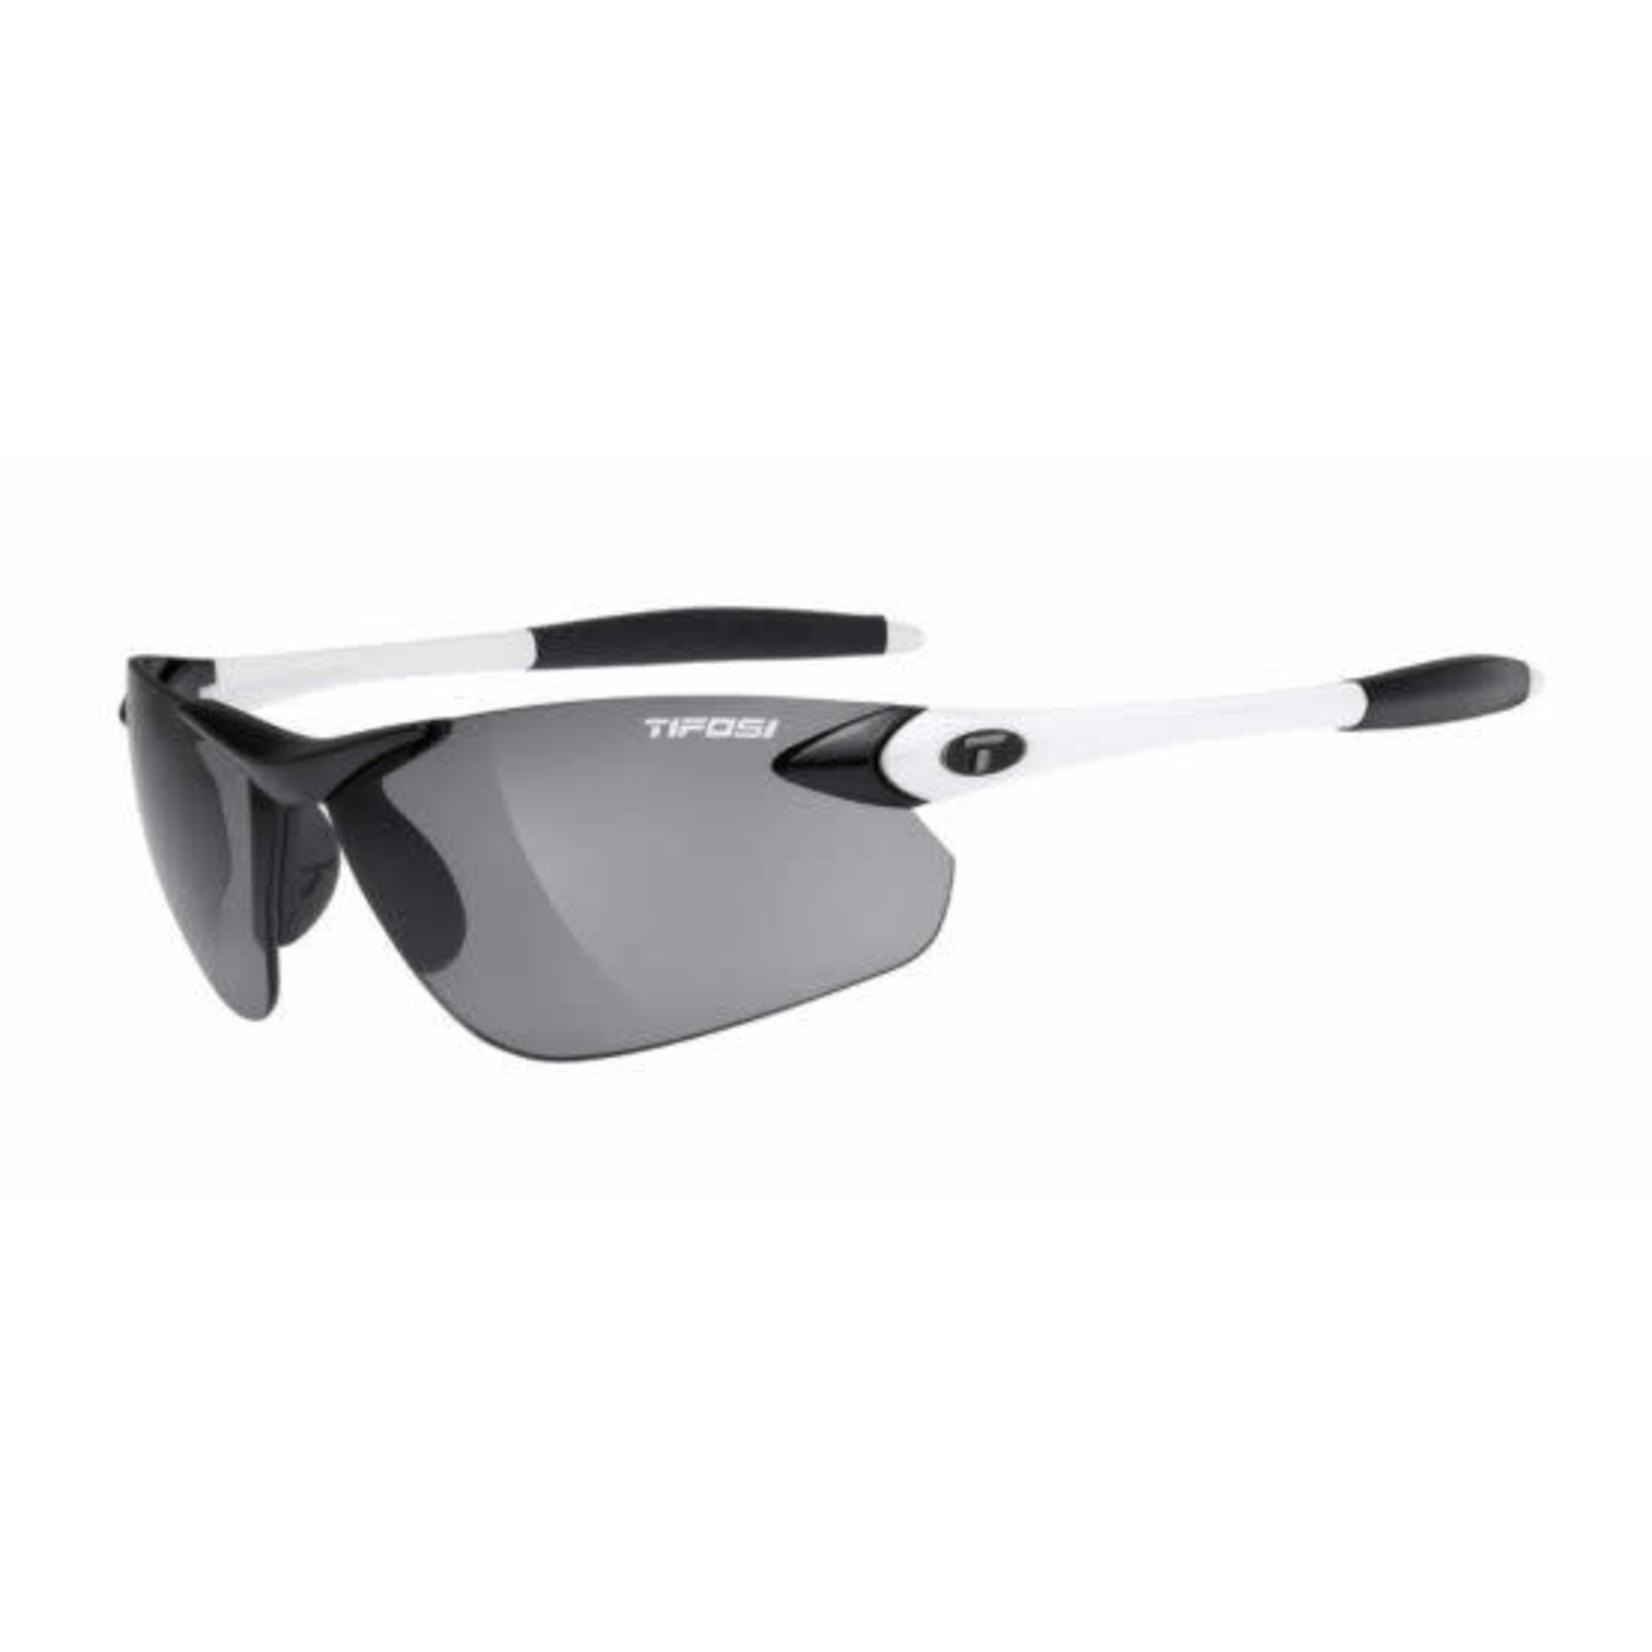 Tifosi Optics Seek FC, White/Black Fototec Sunglasses